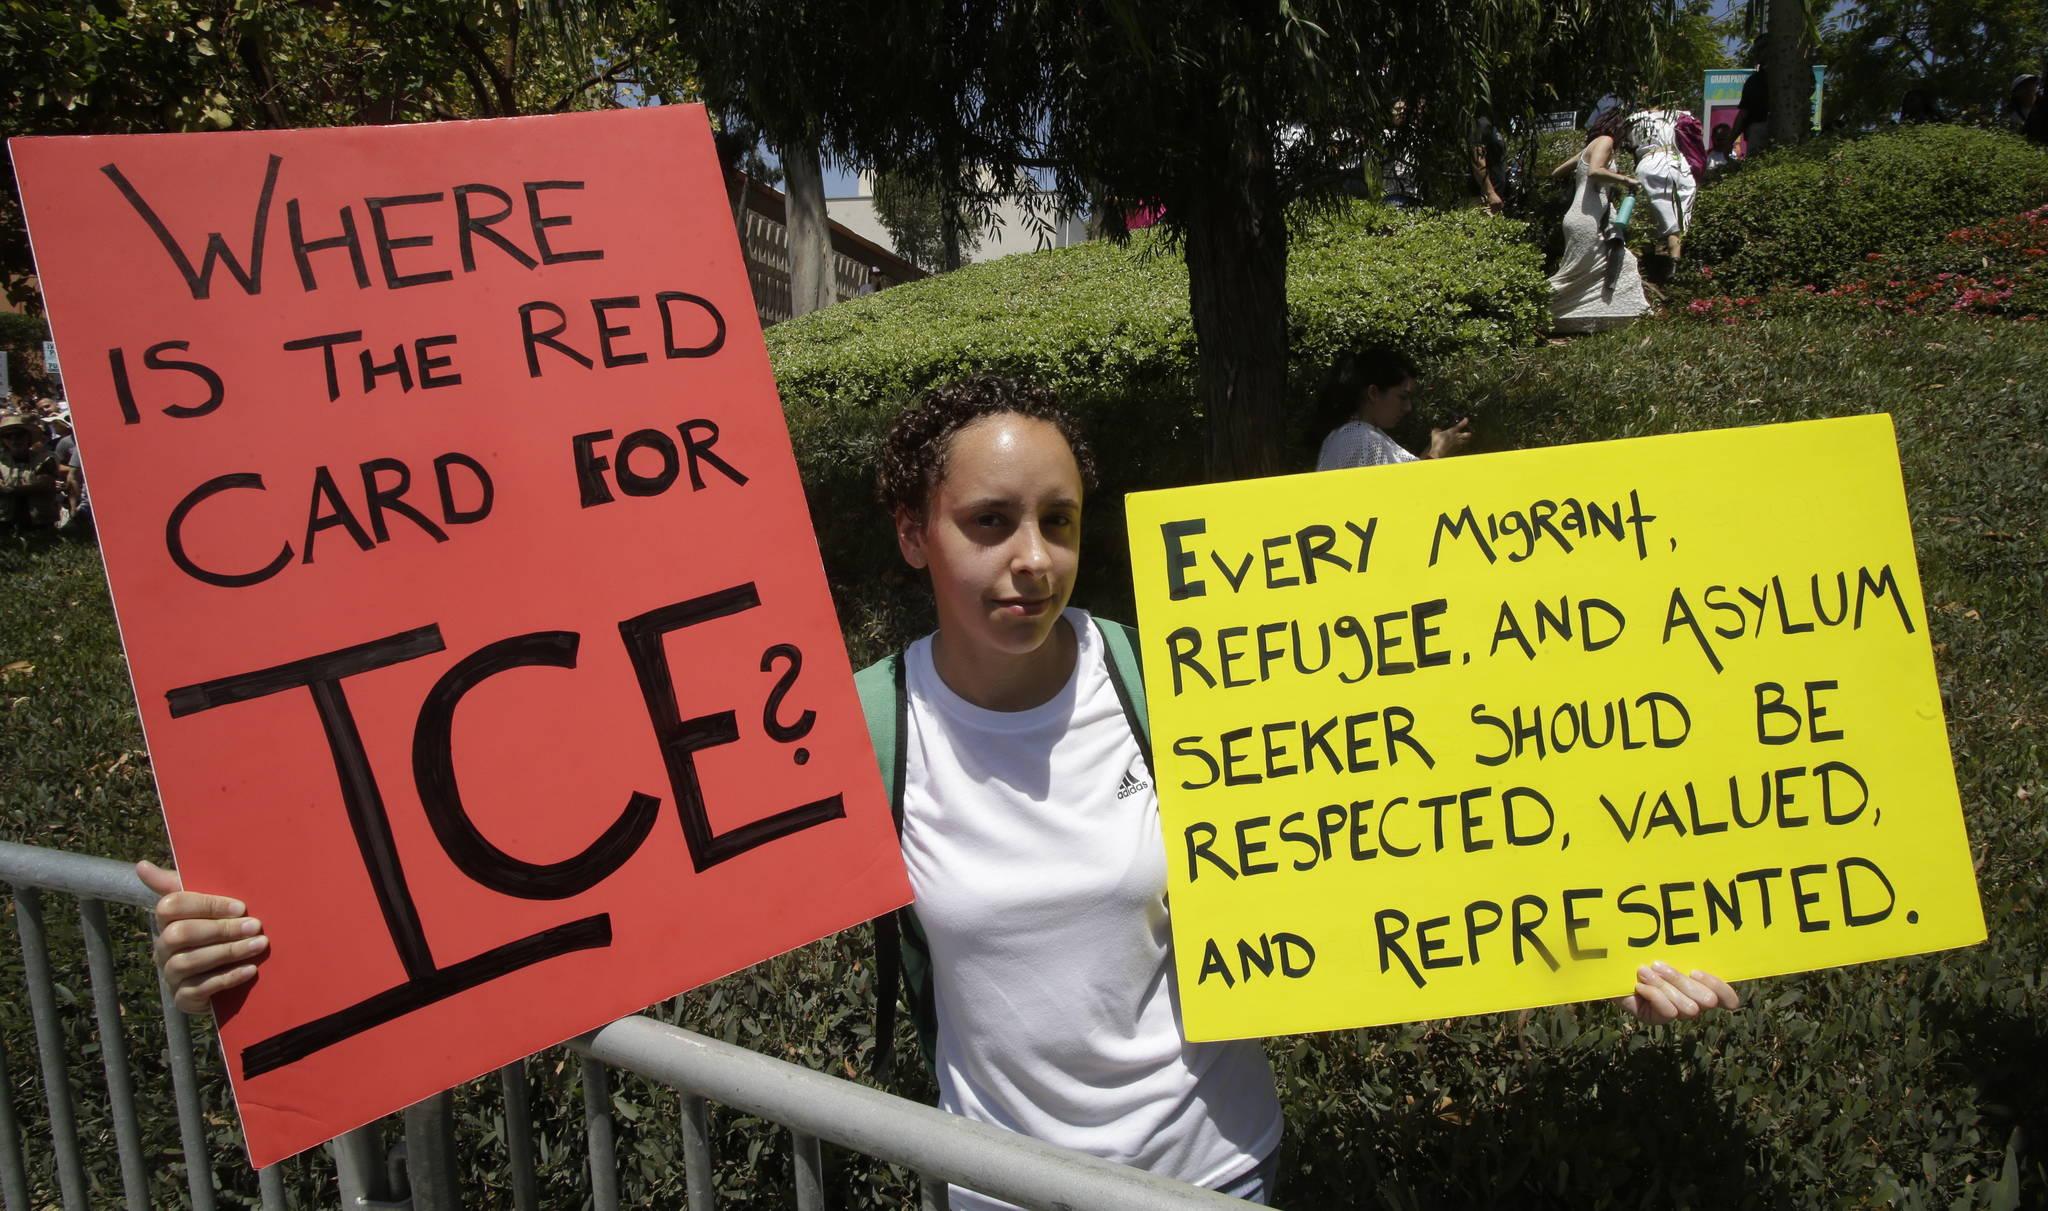 """ICE에게 줄 레드 카드는 어디에?"" 트럼프 대통령의 이민정책에 반대하는 한 LA 시민이 피켓 시위를 펼치고 있다. ICE(Immigration and Customs Enforcement)는 미국 이민세관단속국이다. [EPA=연합뉴스]"